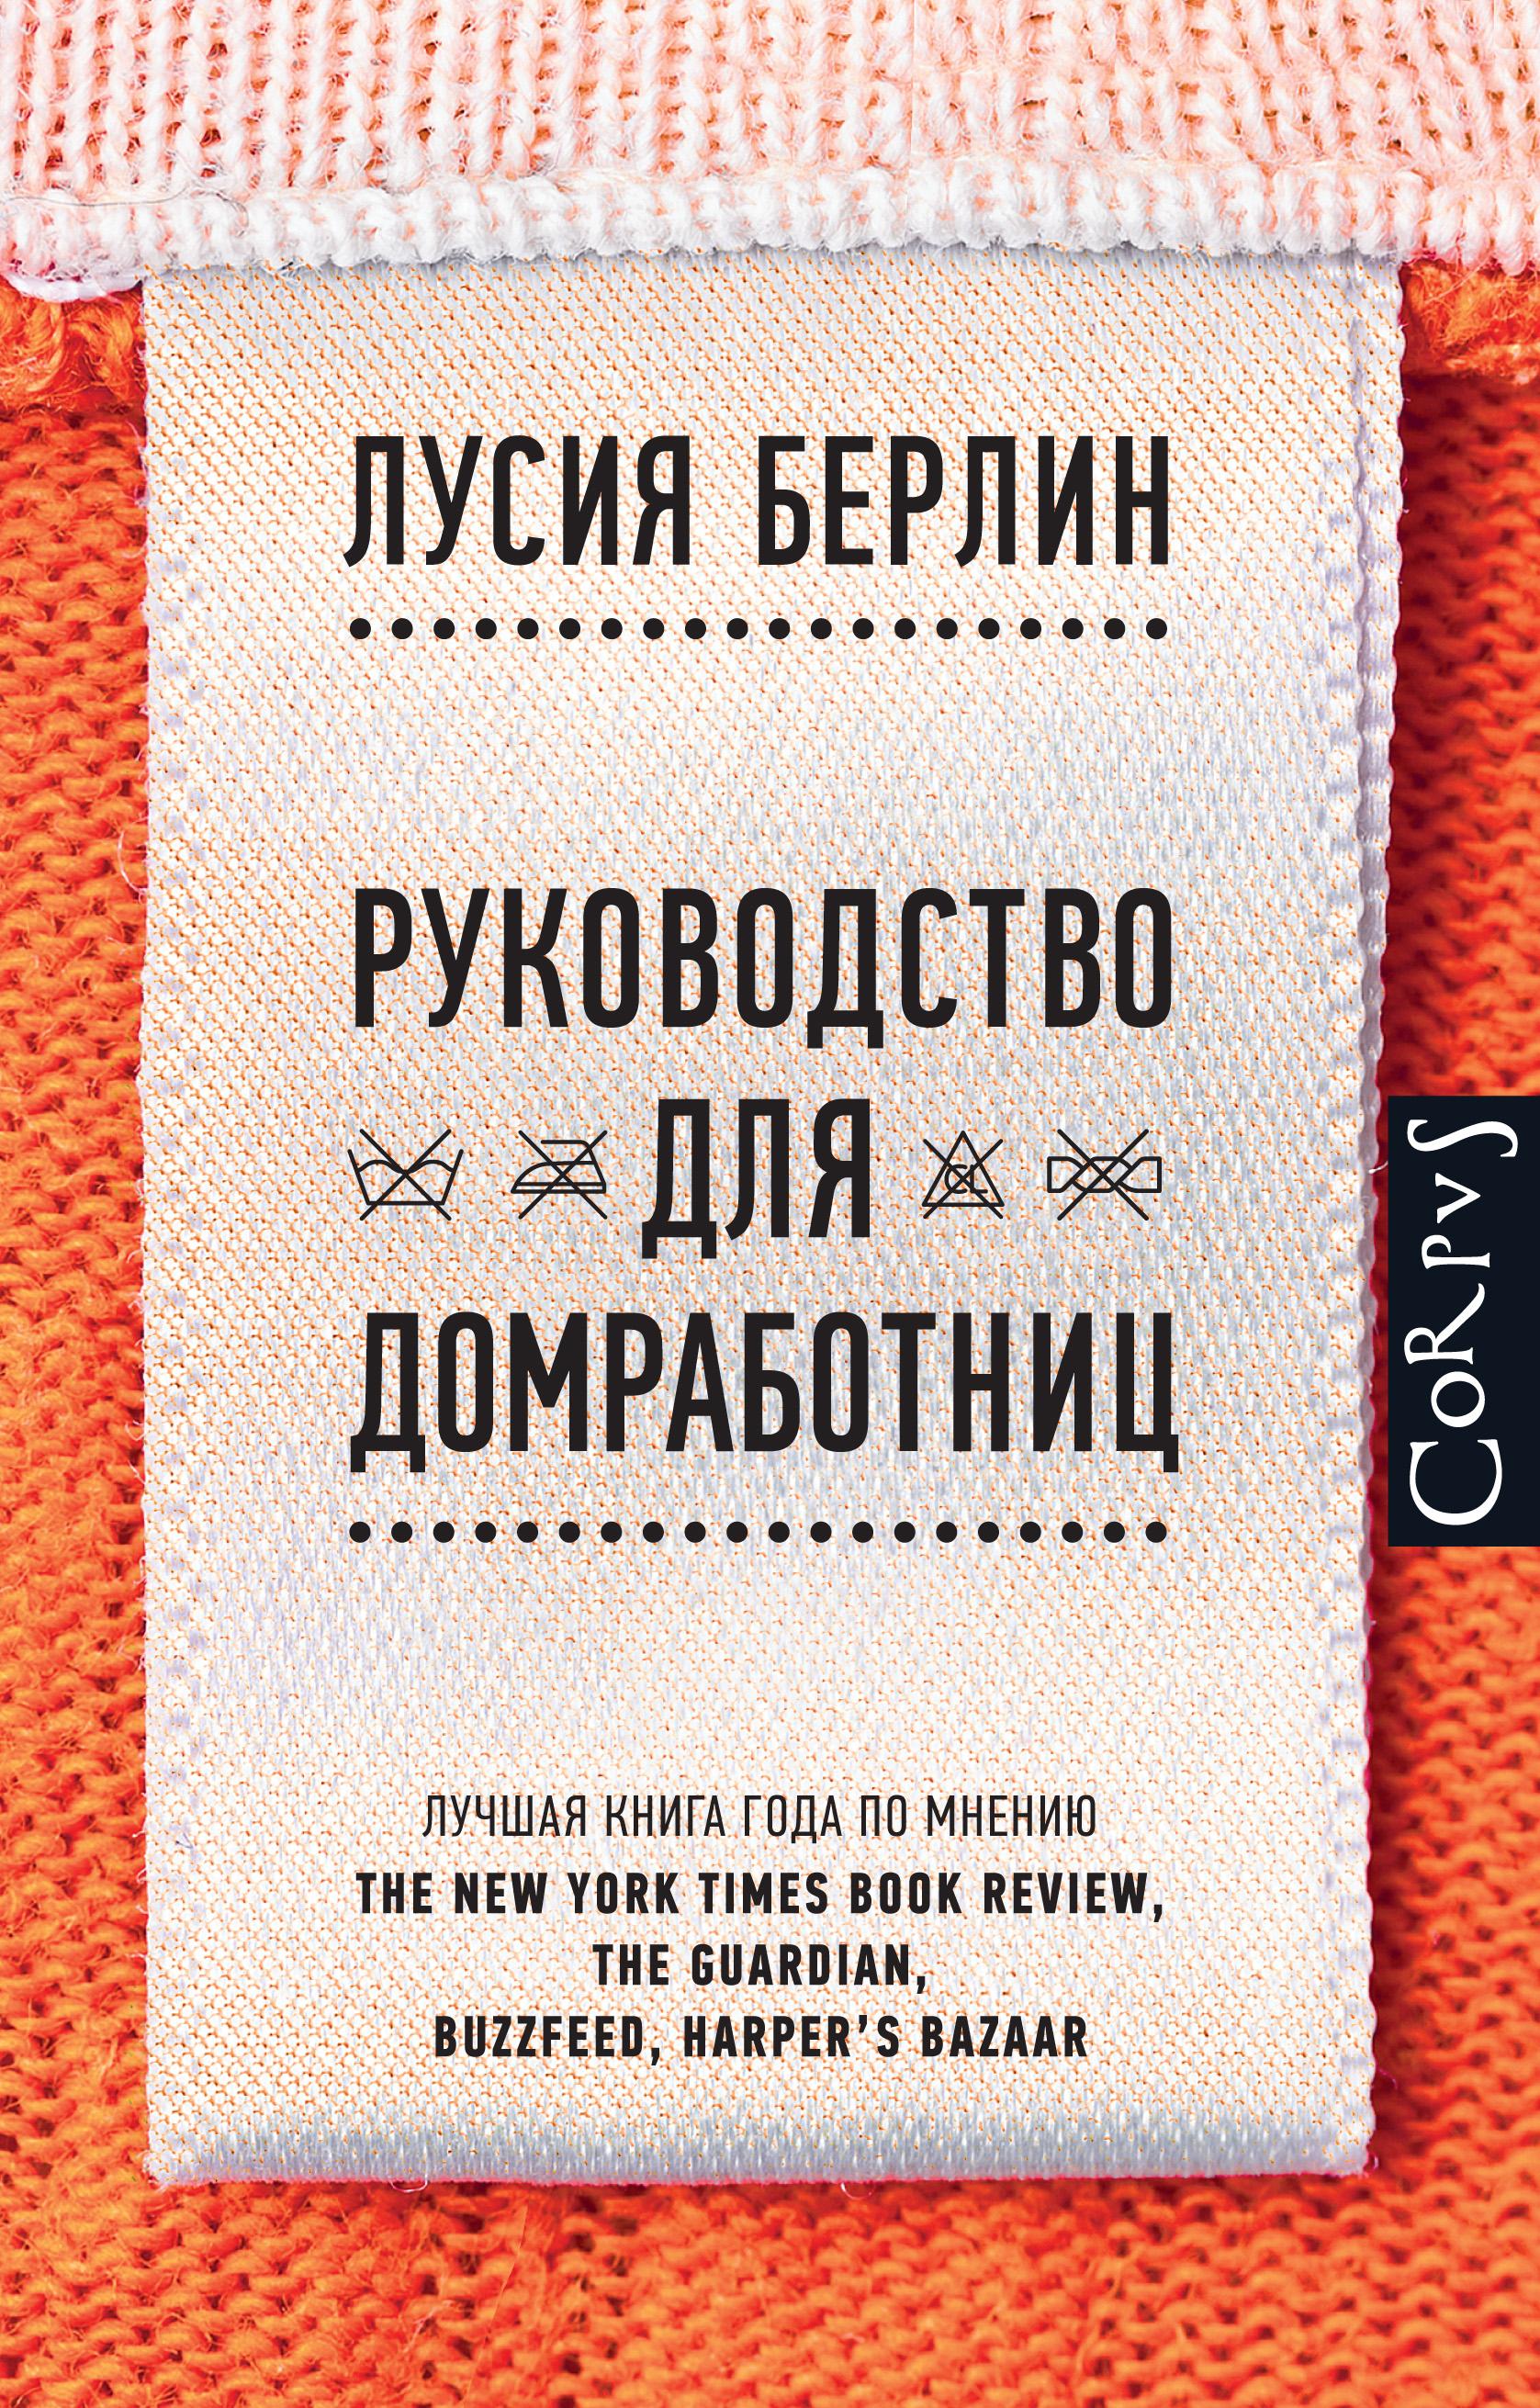 Руководство для домработниц (сборник)